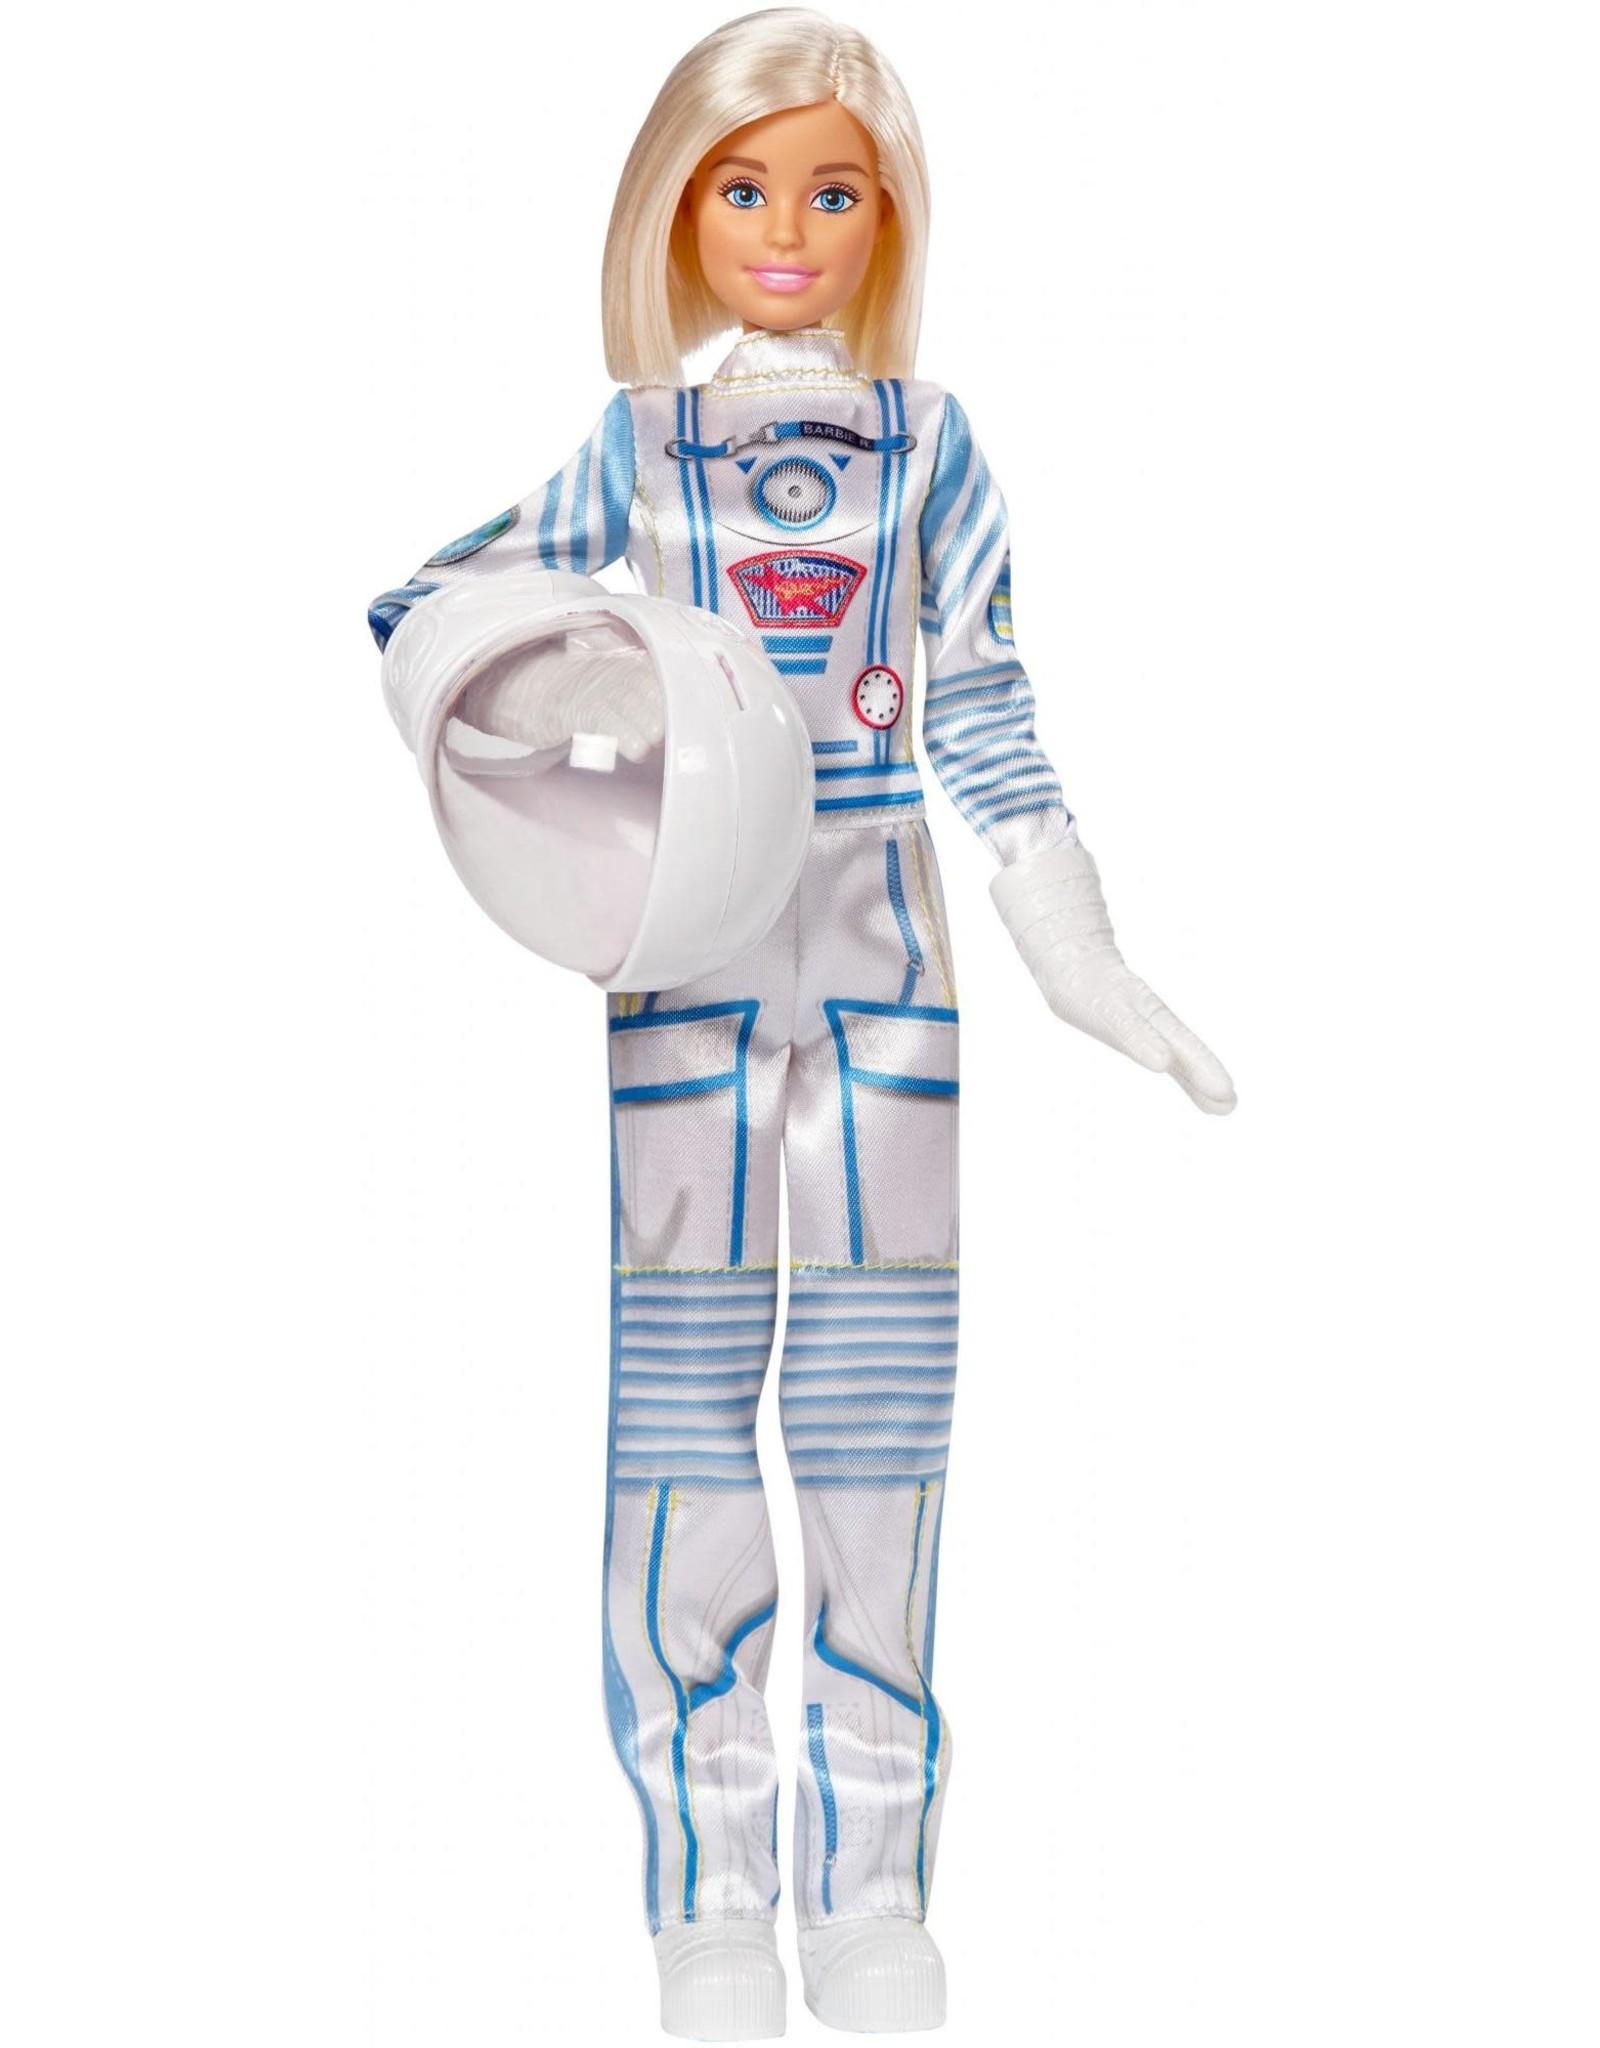 Mattel Barbie Astronaut